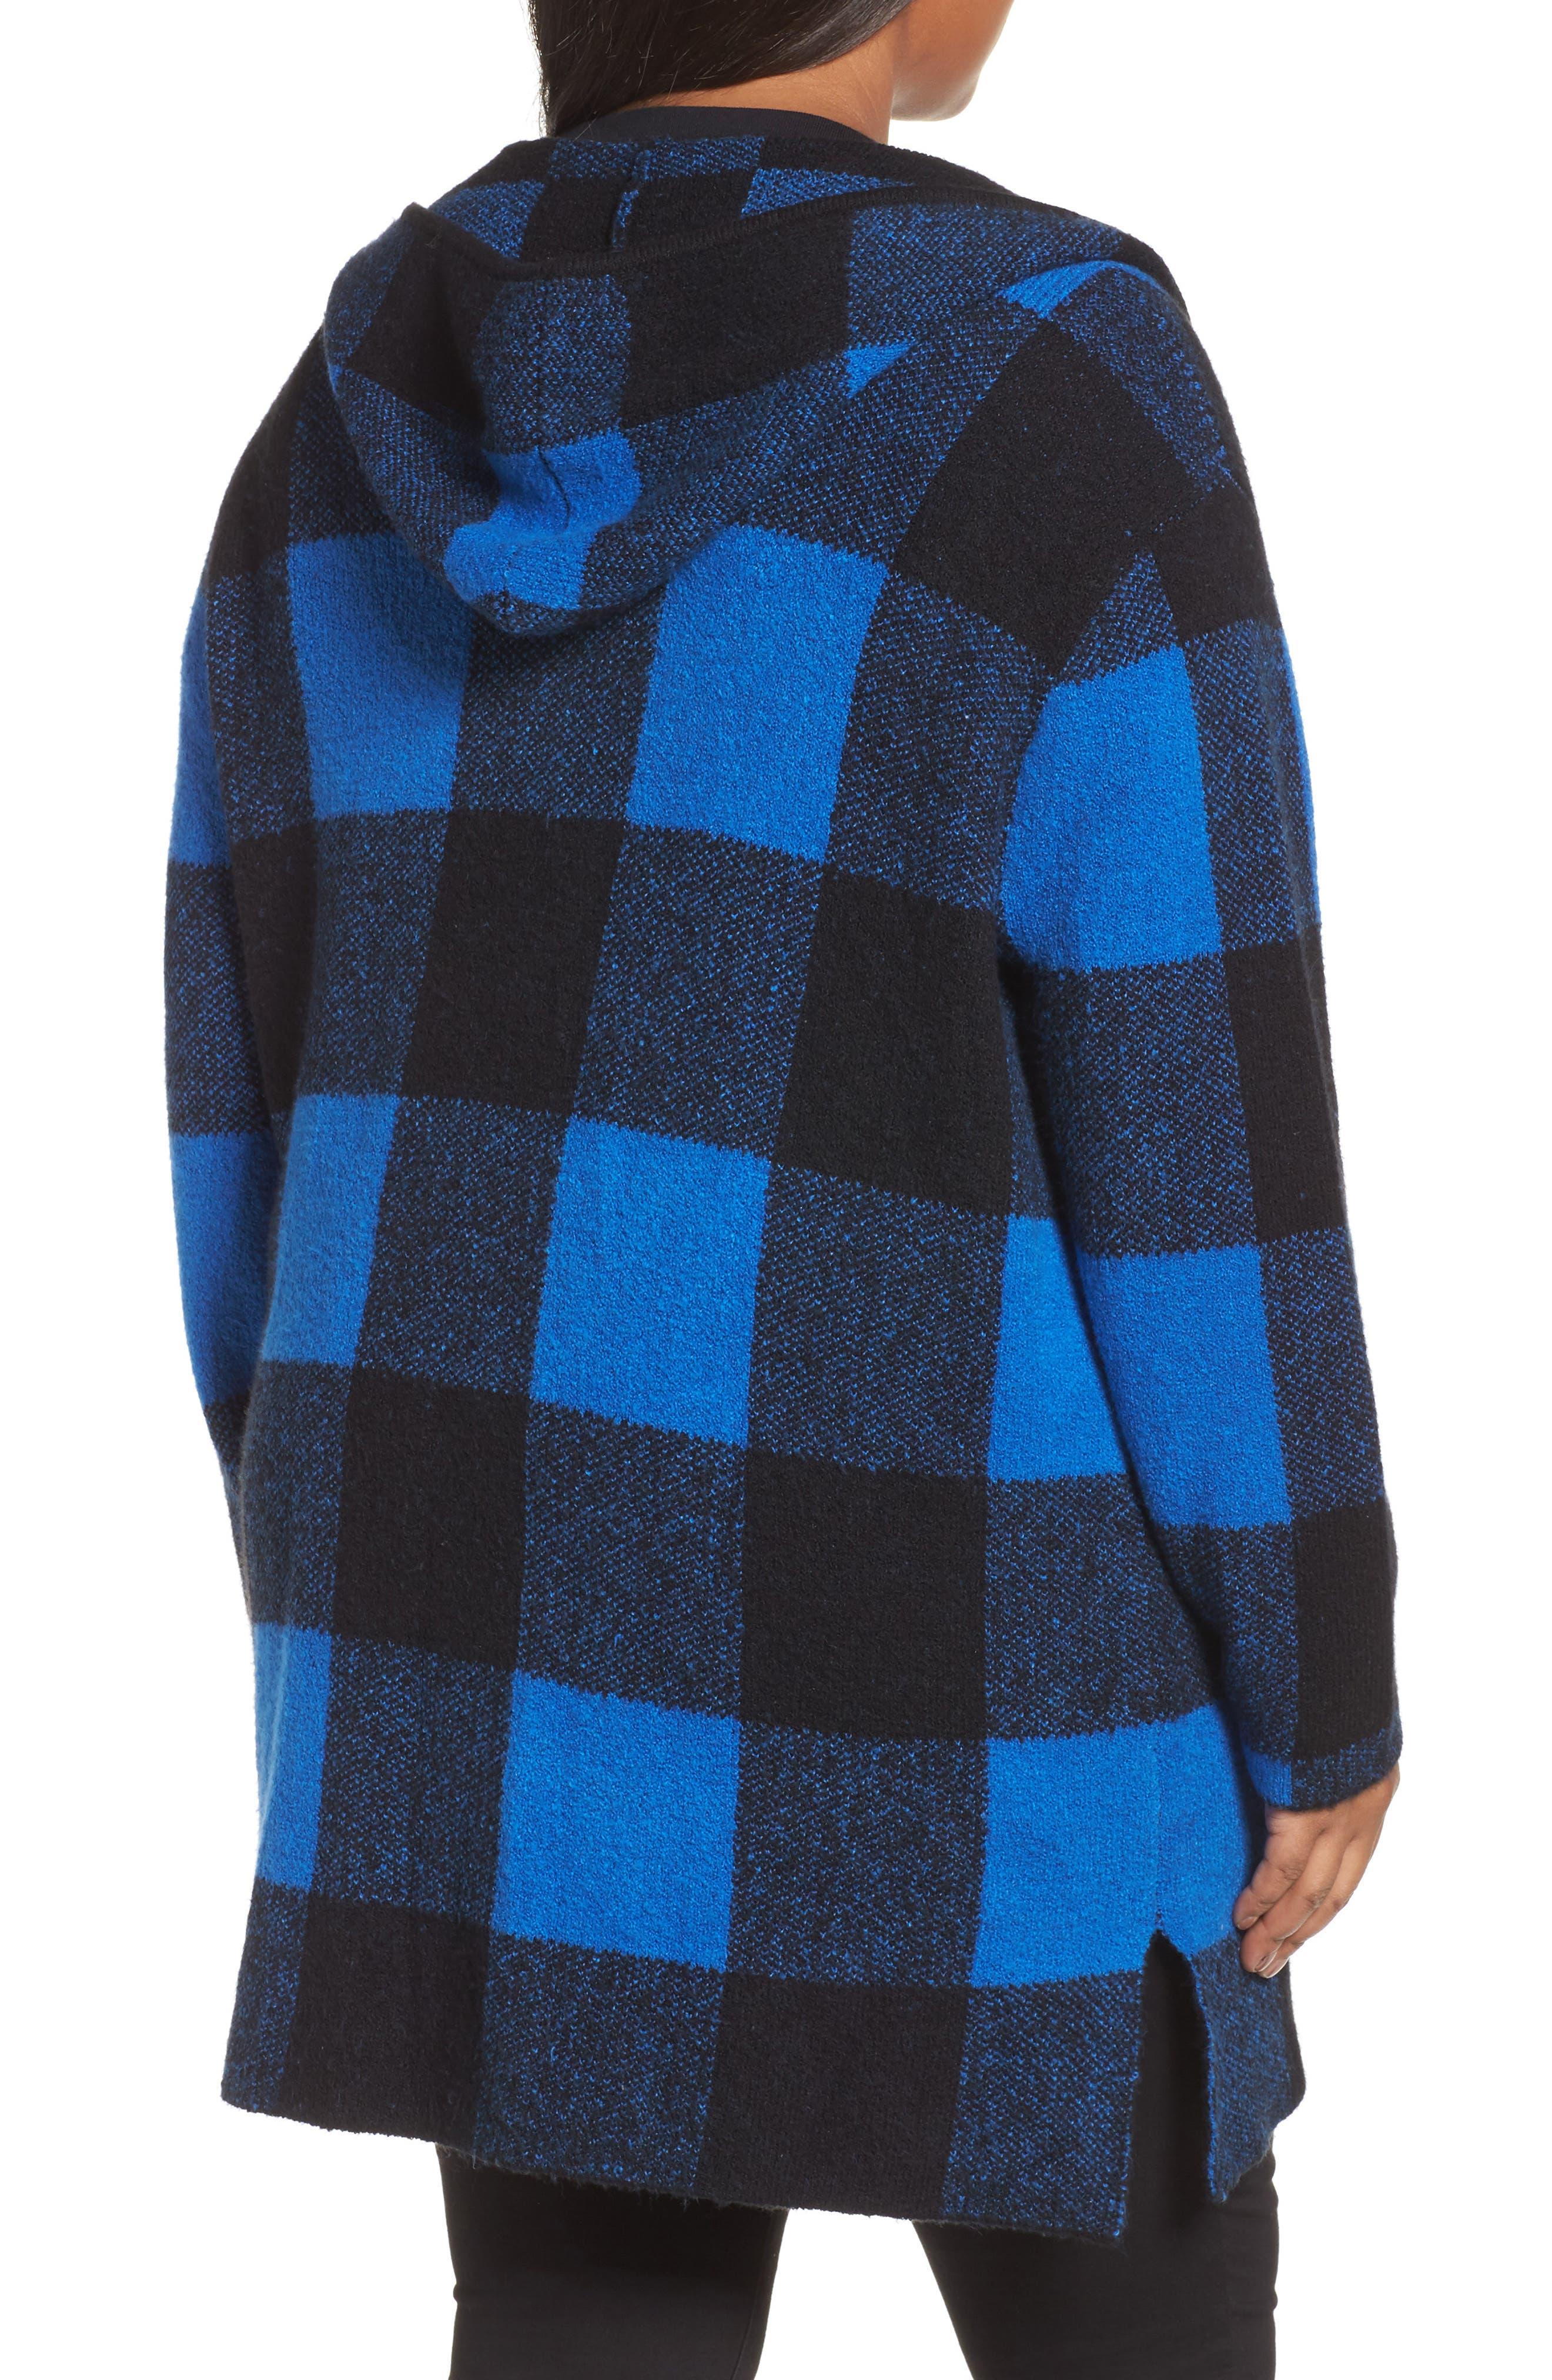 Plaid Hooded Sweater Coatigan,                             Alternate thumbnail 2, color,                             Blue Checkerboard Jacquard